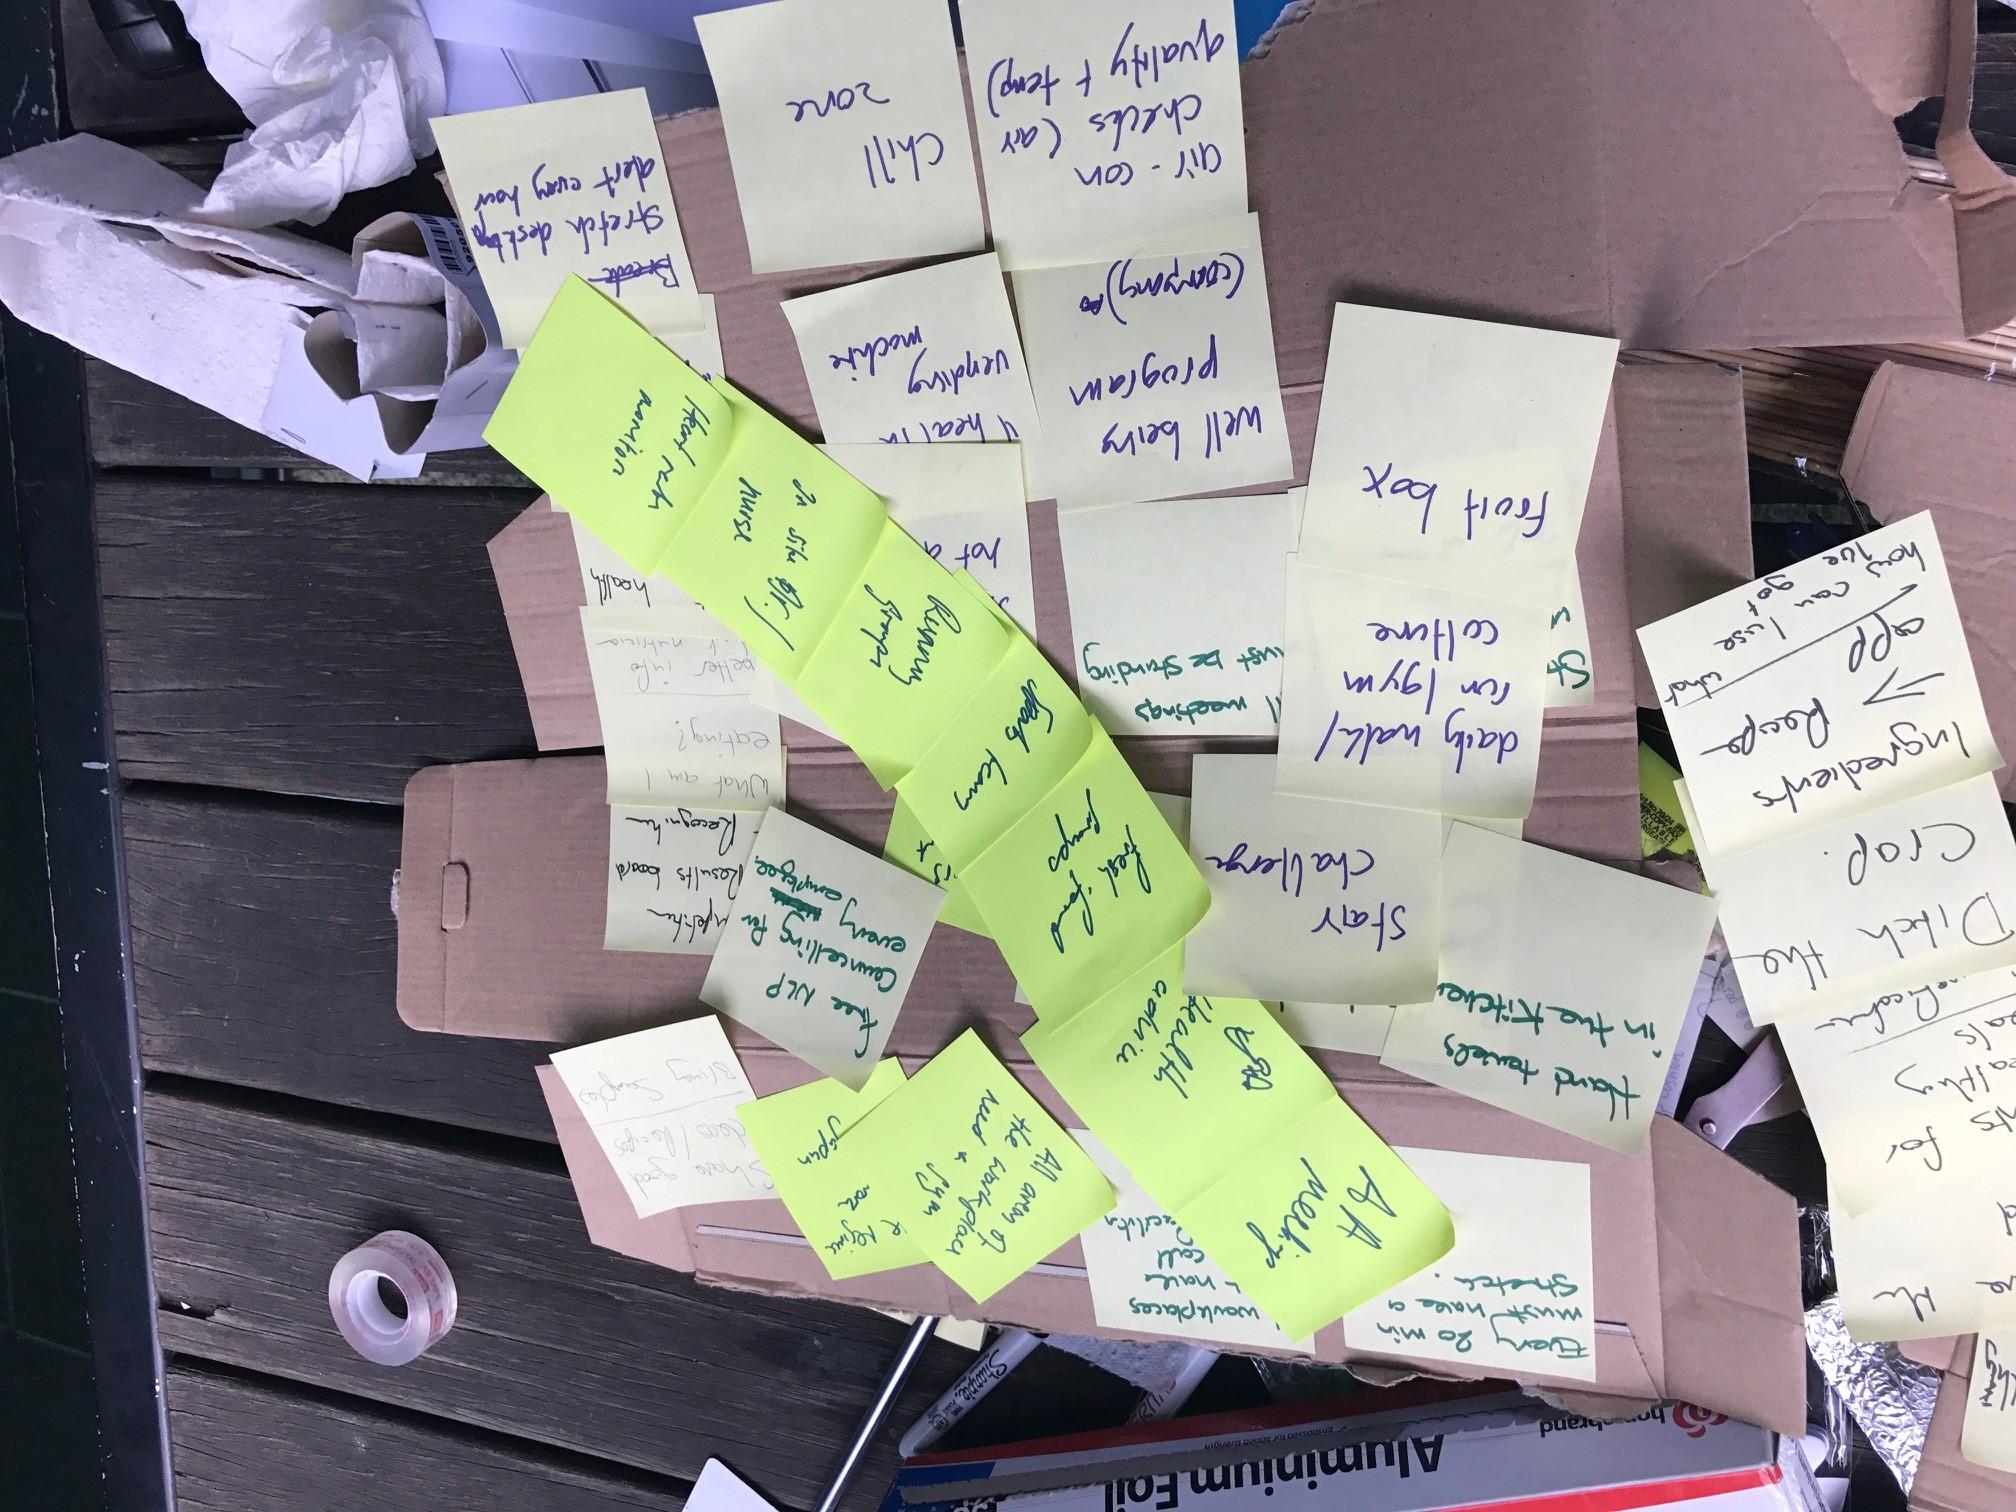 product design methods: brainstorming